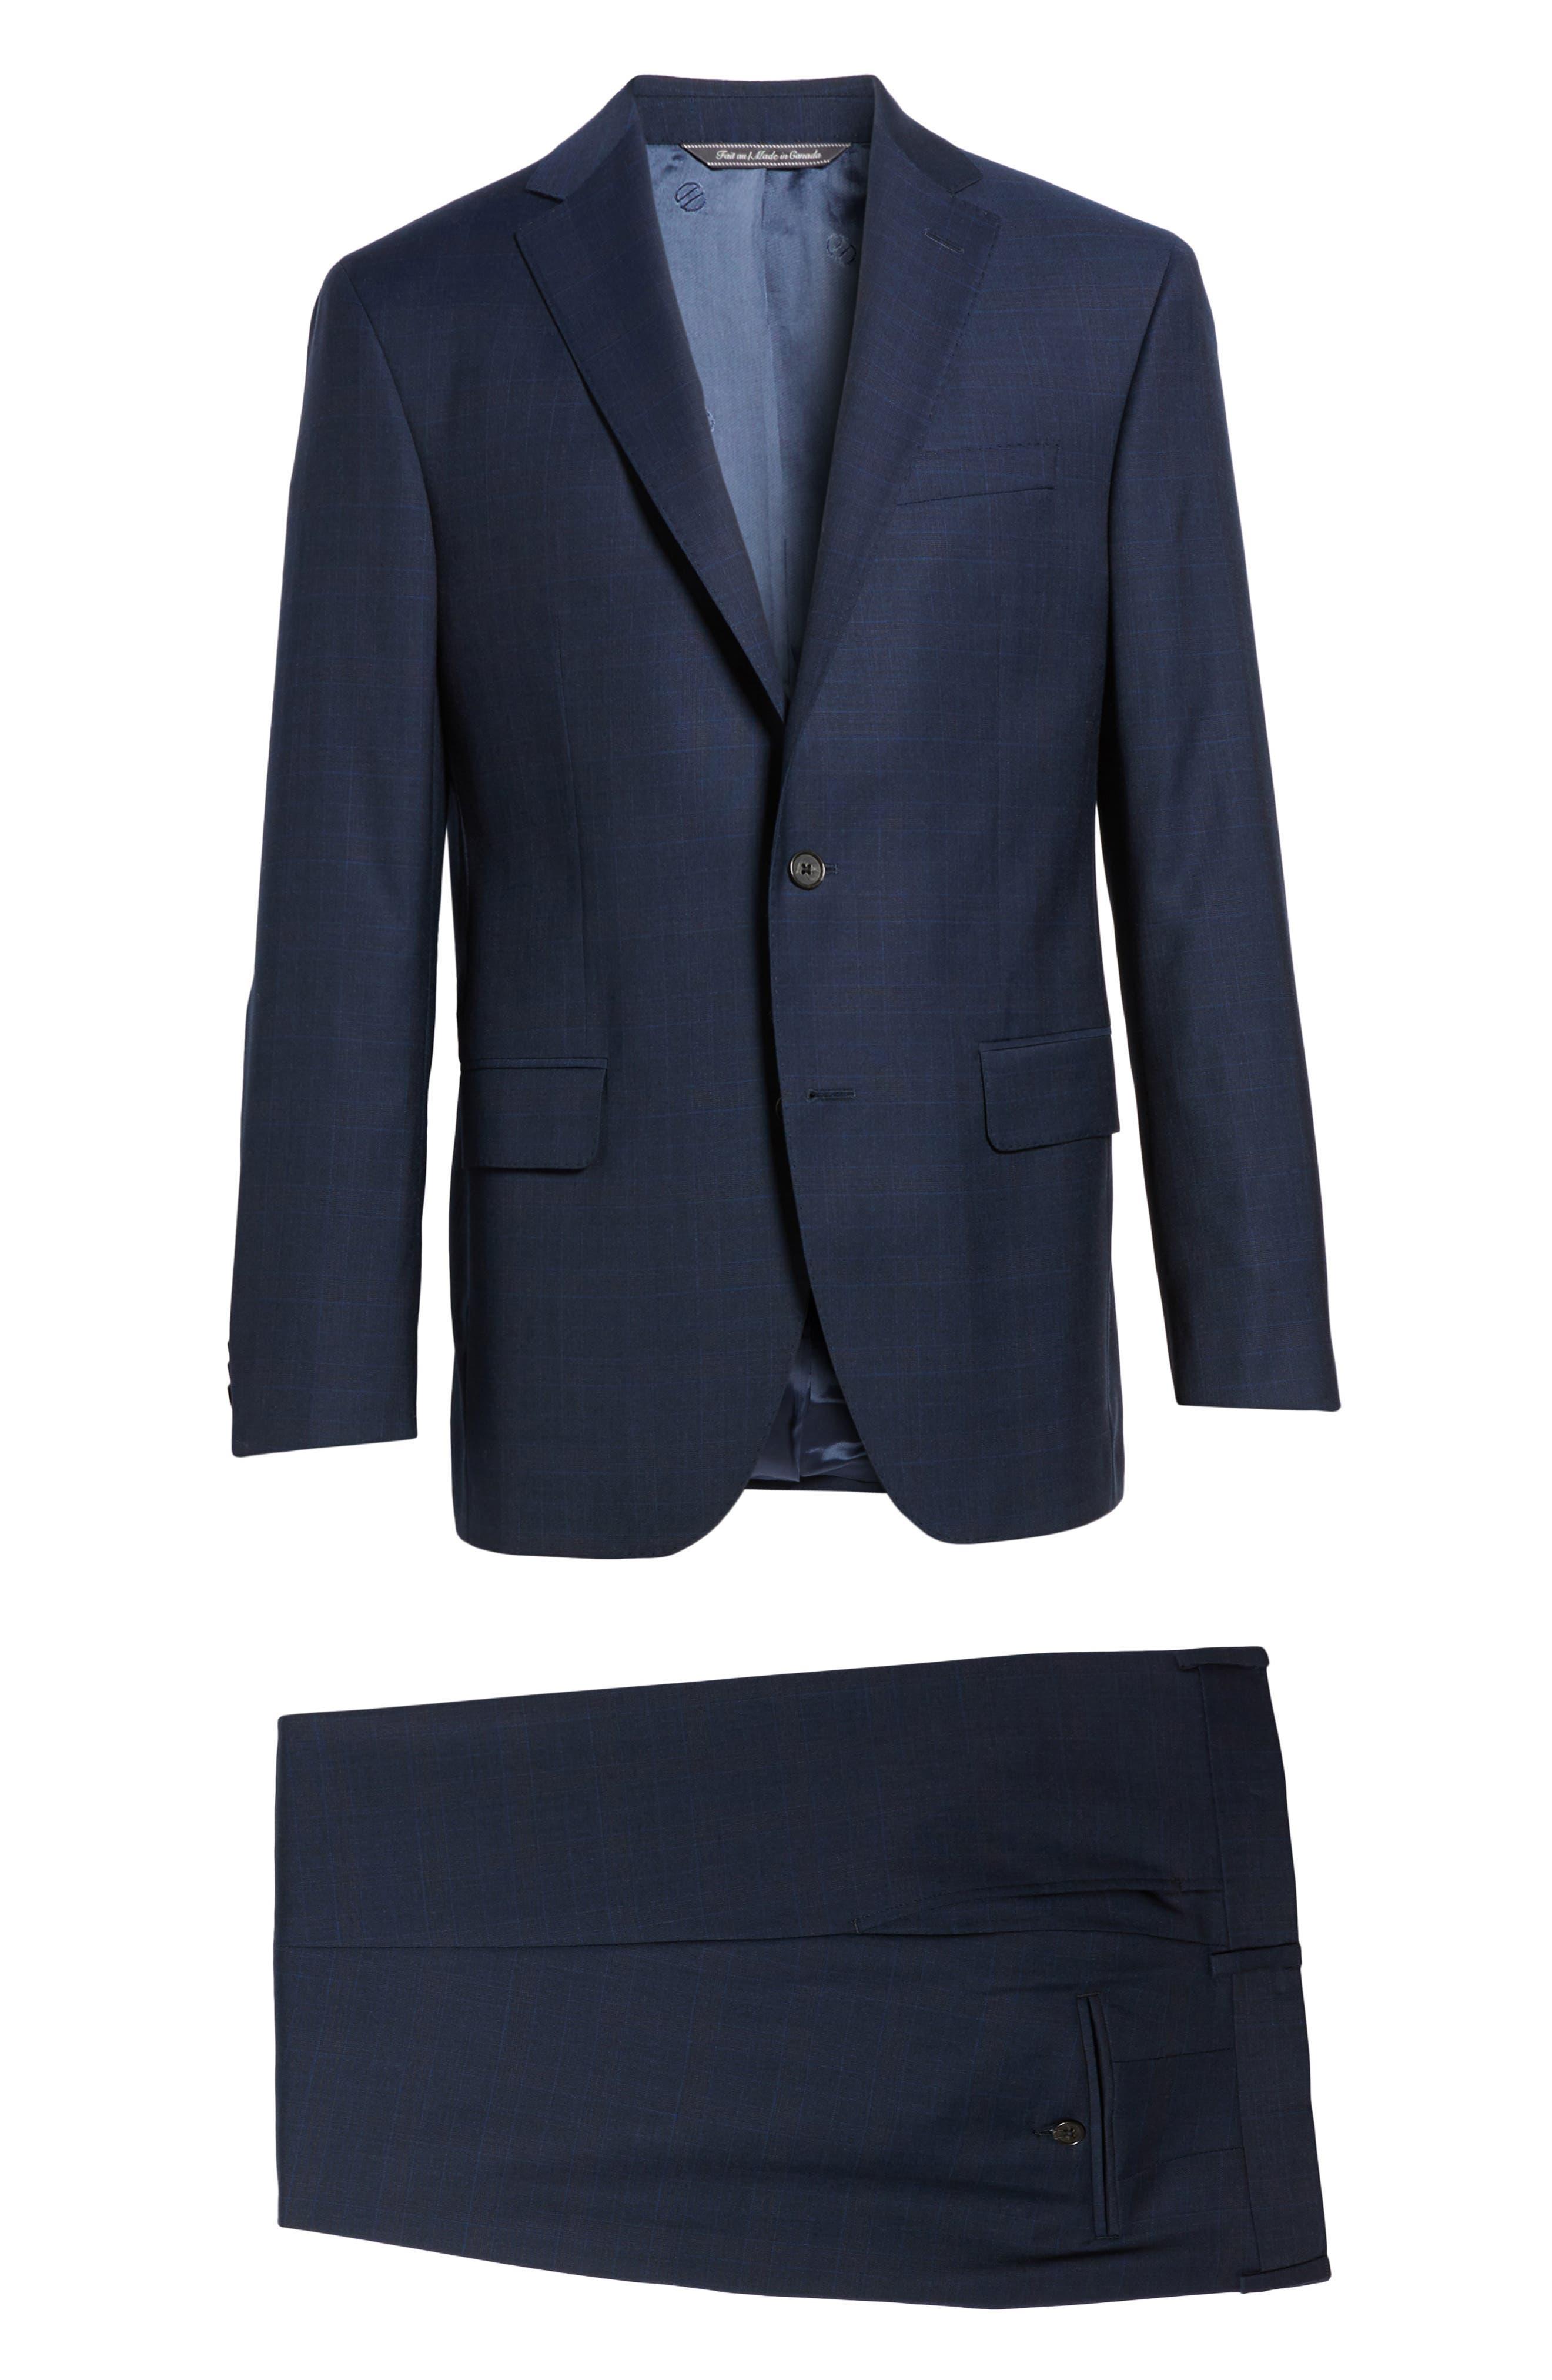 Ryan Classic Fit Plaid Wool Suit,                             Alternate thumbnail 8, color,                             410